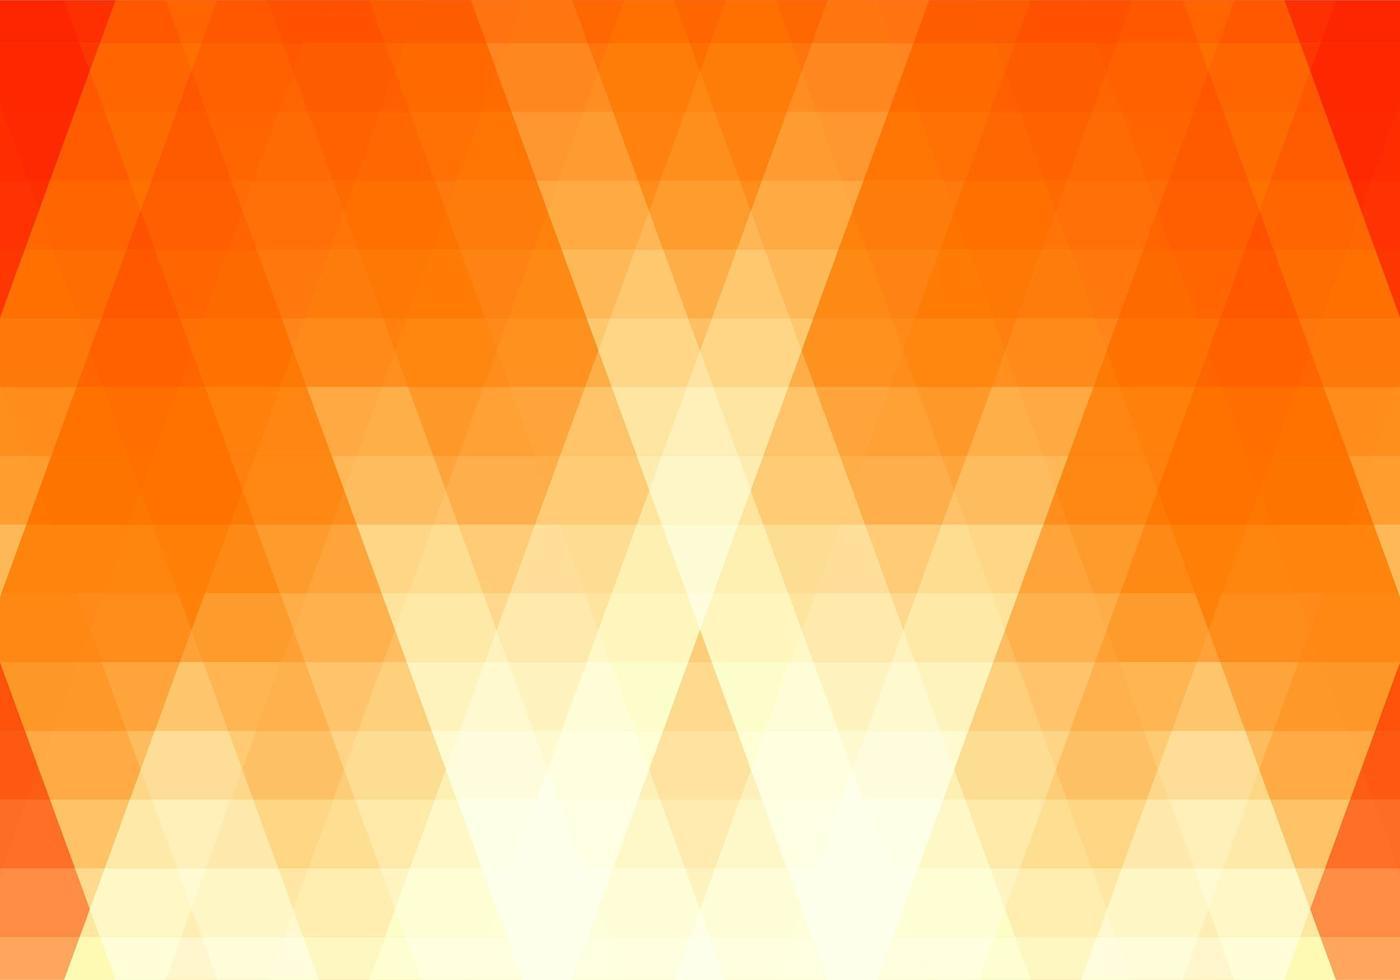 abstract oranje, witte driehoek vormen achtergrond vector